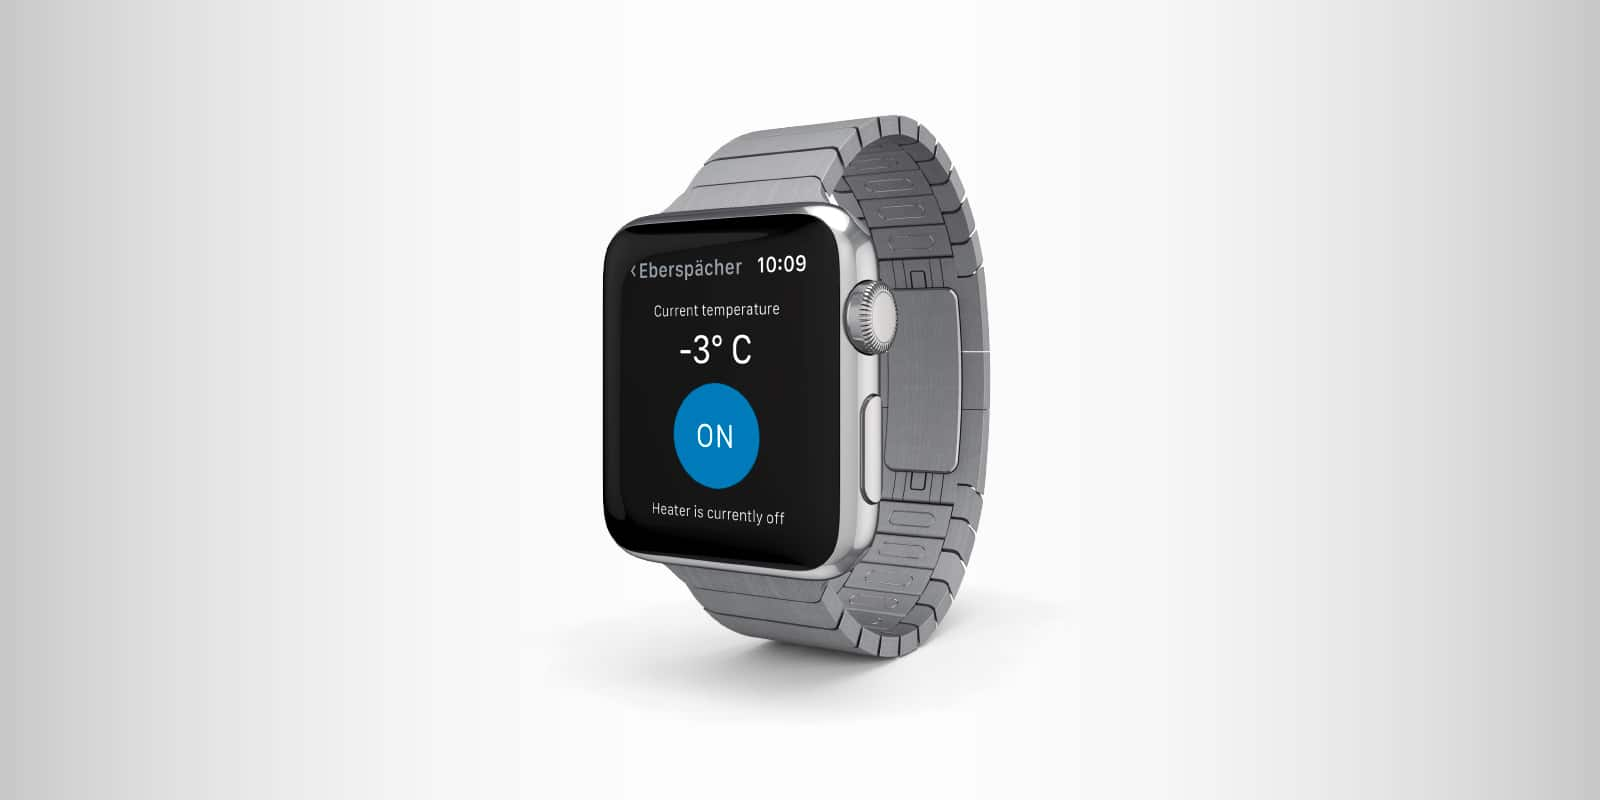 Eberspächer Screendesign Smartwatch-App